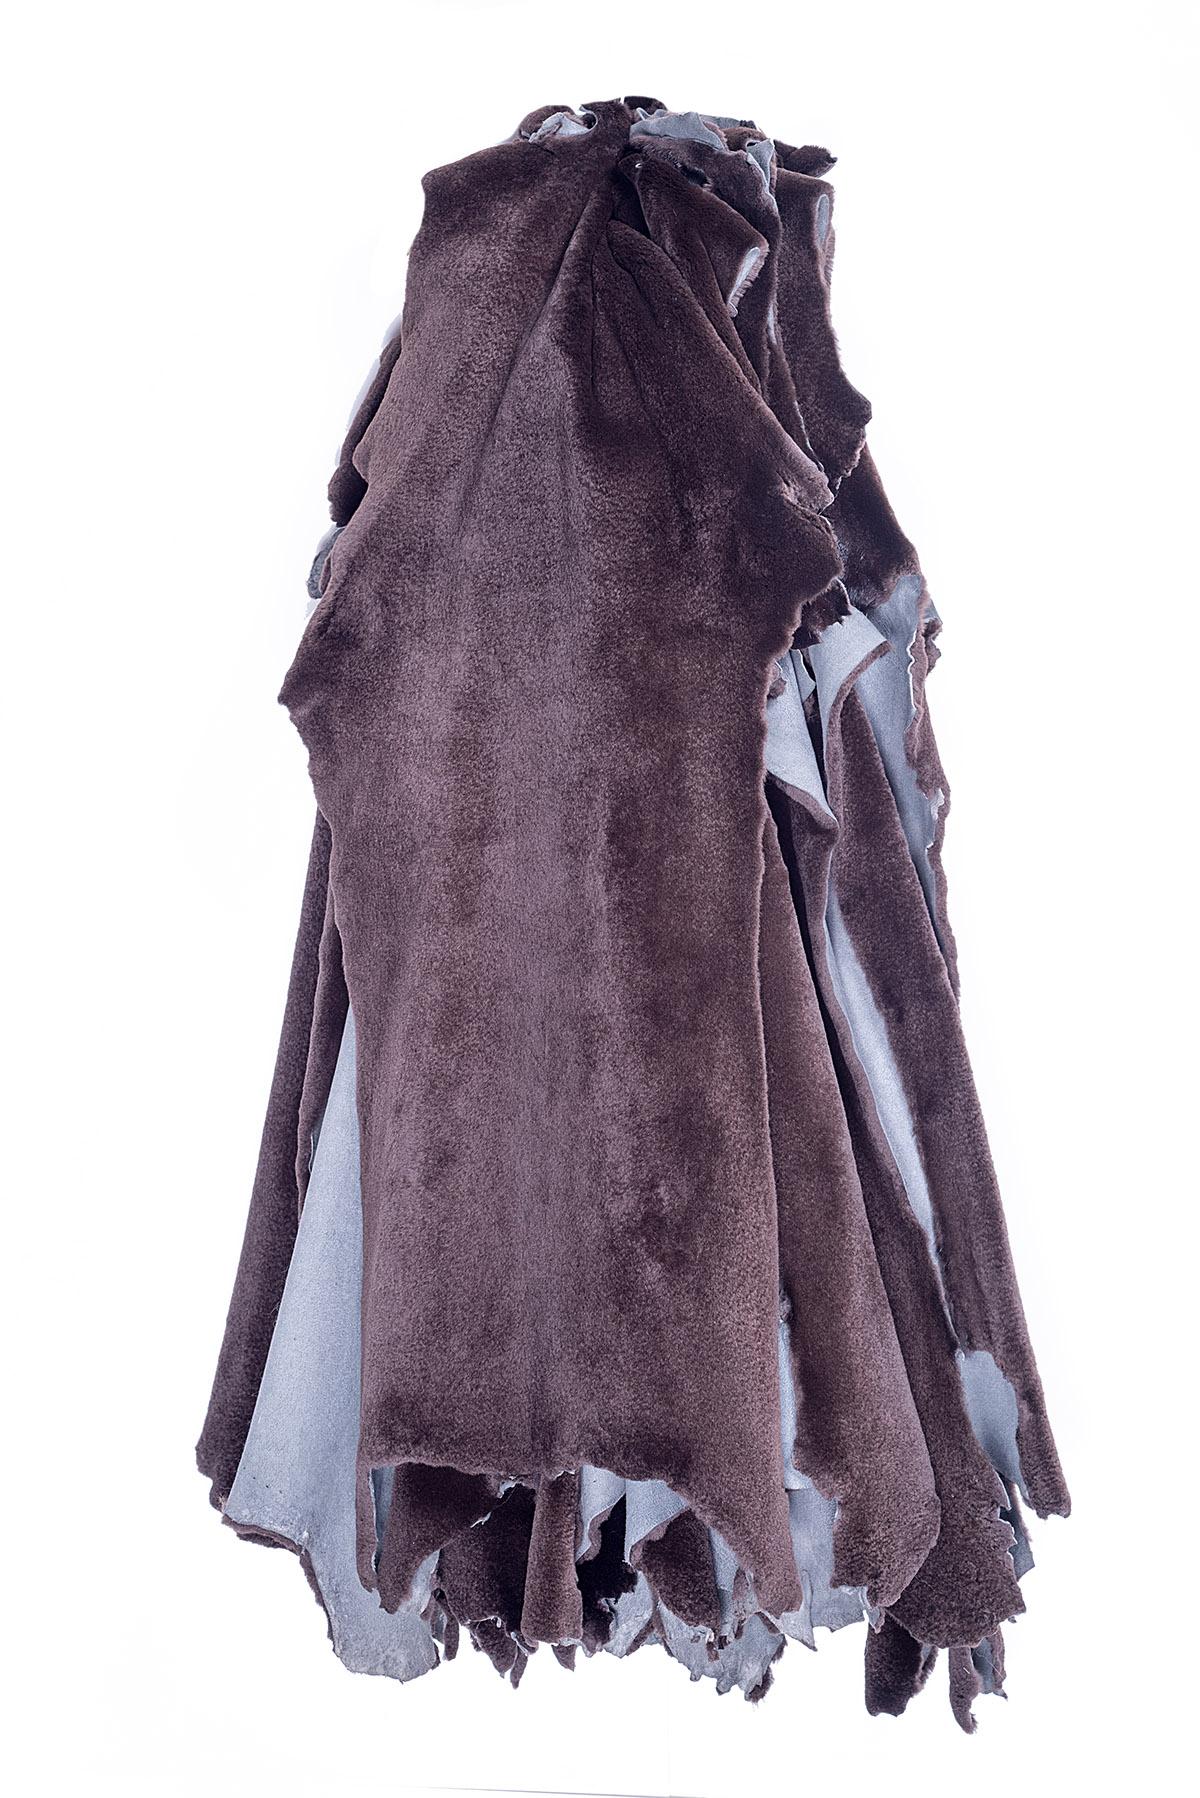 Норка коричневый вельвет щипаная (Chocolate Velvet Sheered)